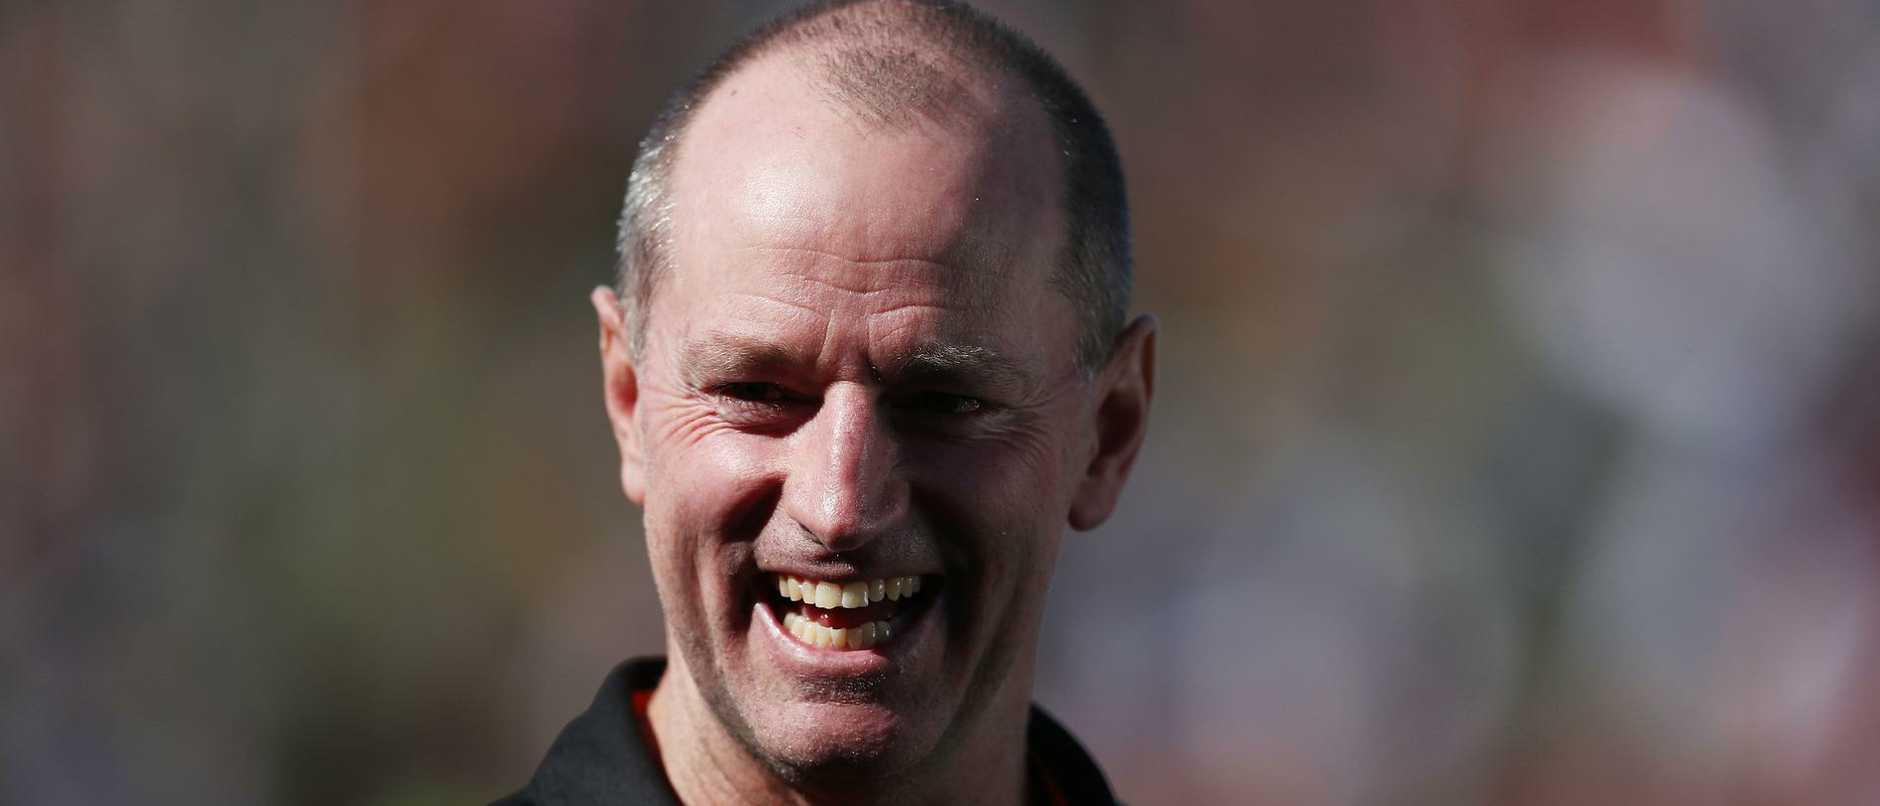 NRL Rd 3 - Wests Tigers v Bulldogs